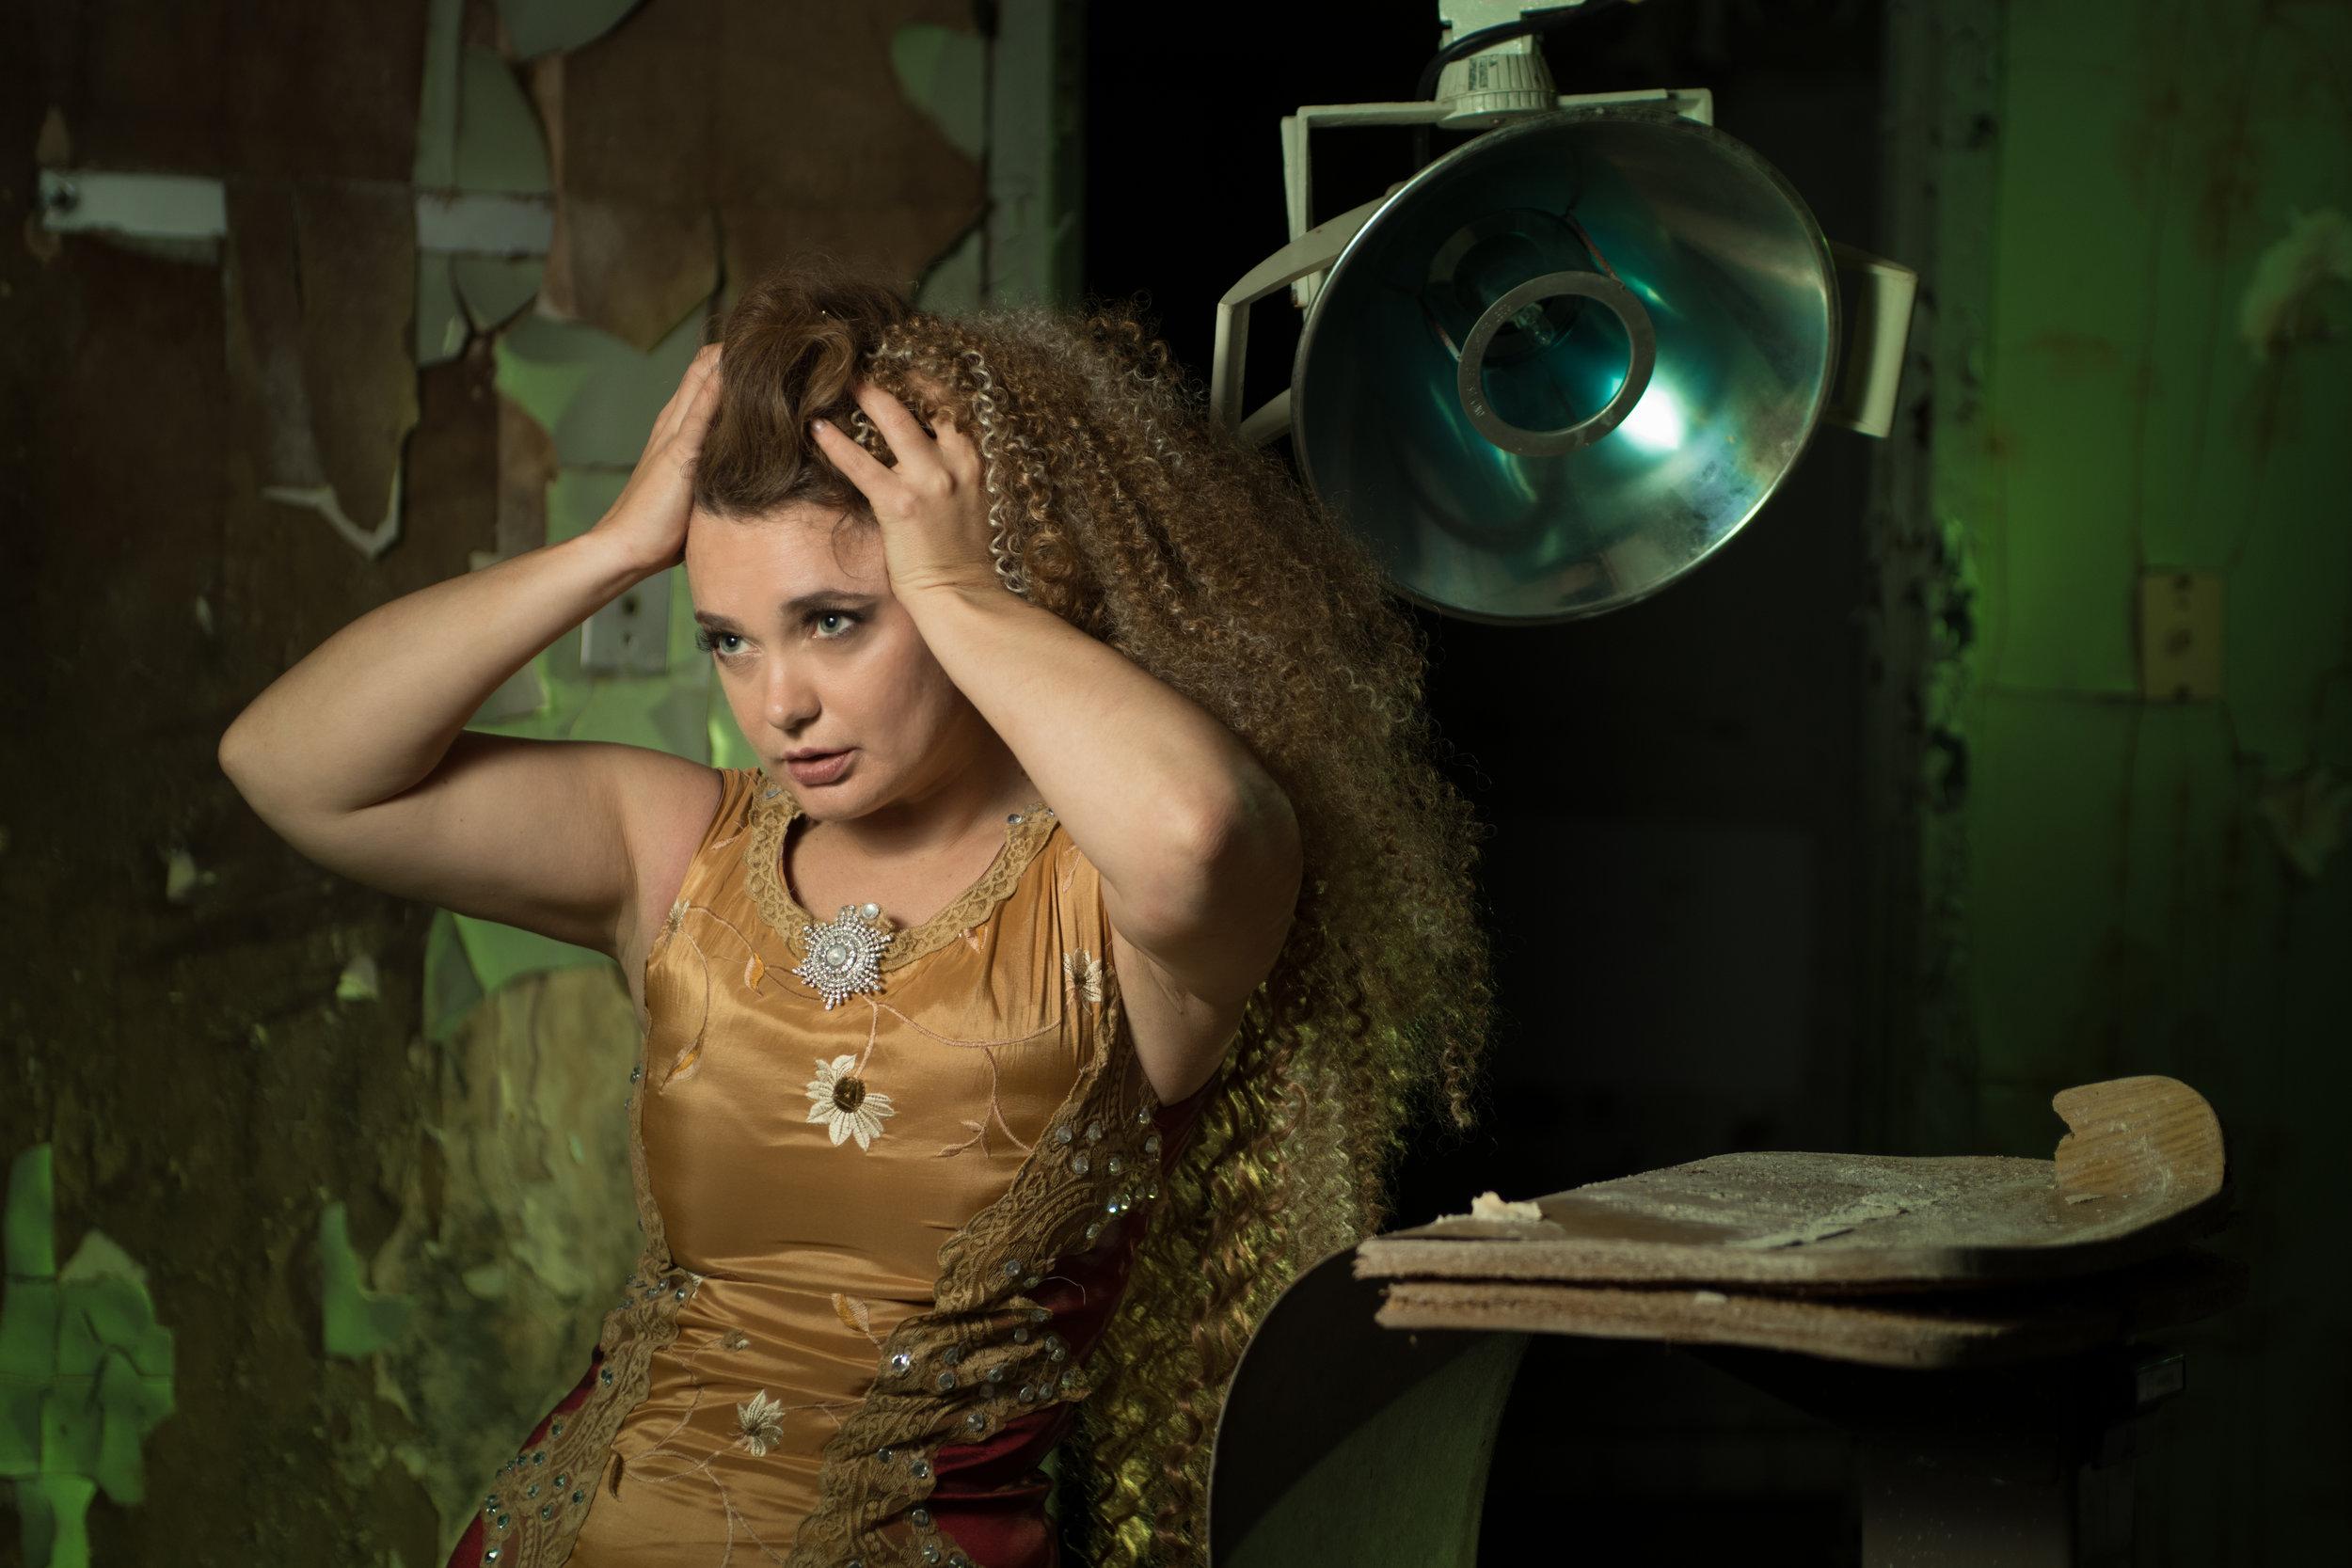 Photographer: Homan Wong, Model: Olha Vayda, MUA: Samantha Terry, Hair: Bianca Naranjo. Designer: Mario & Jorge